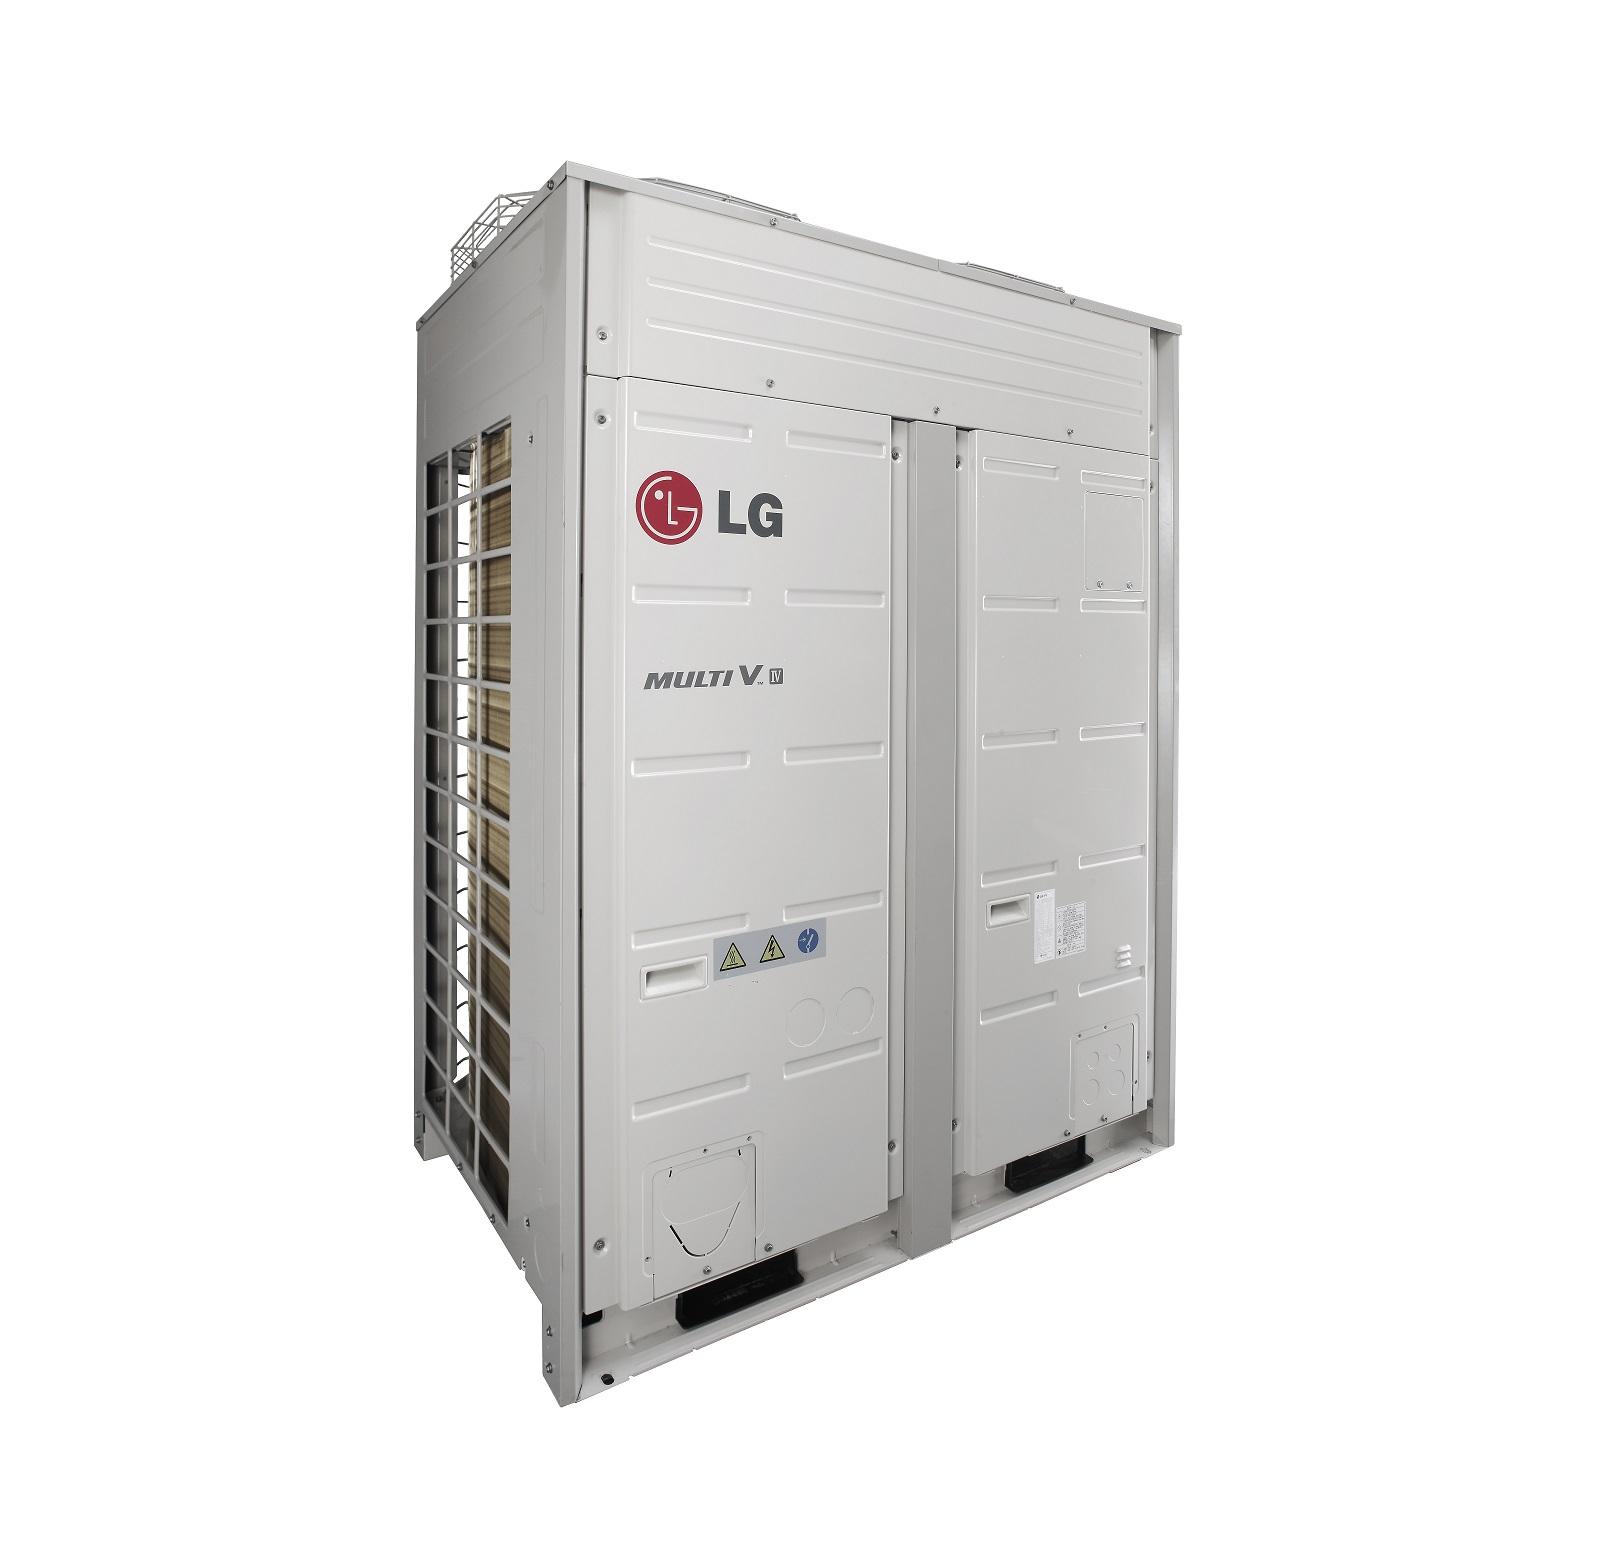 LG Multi V